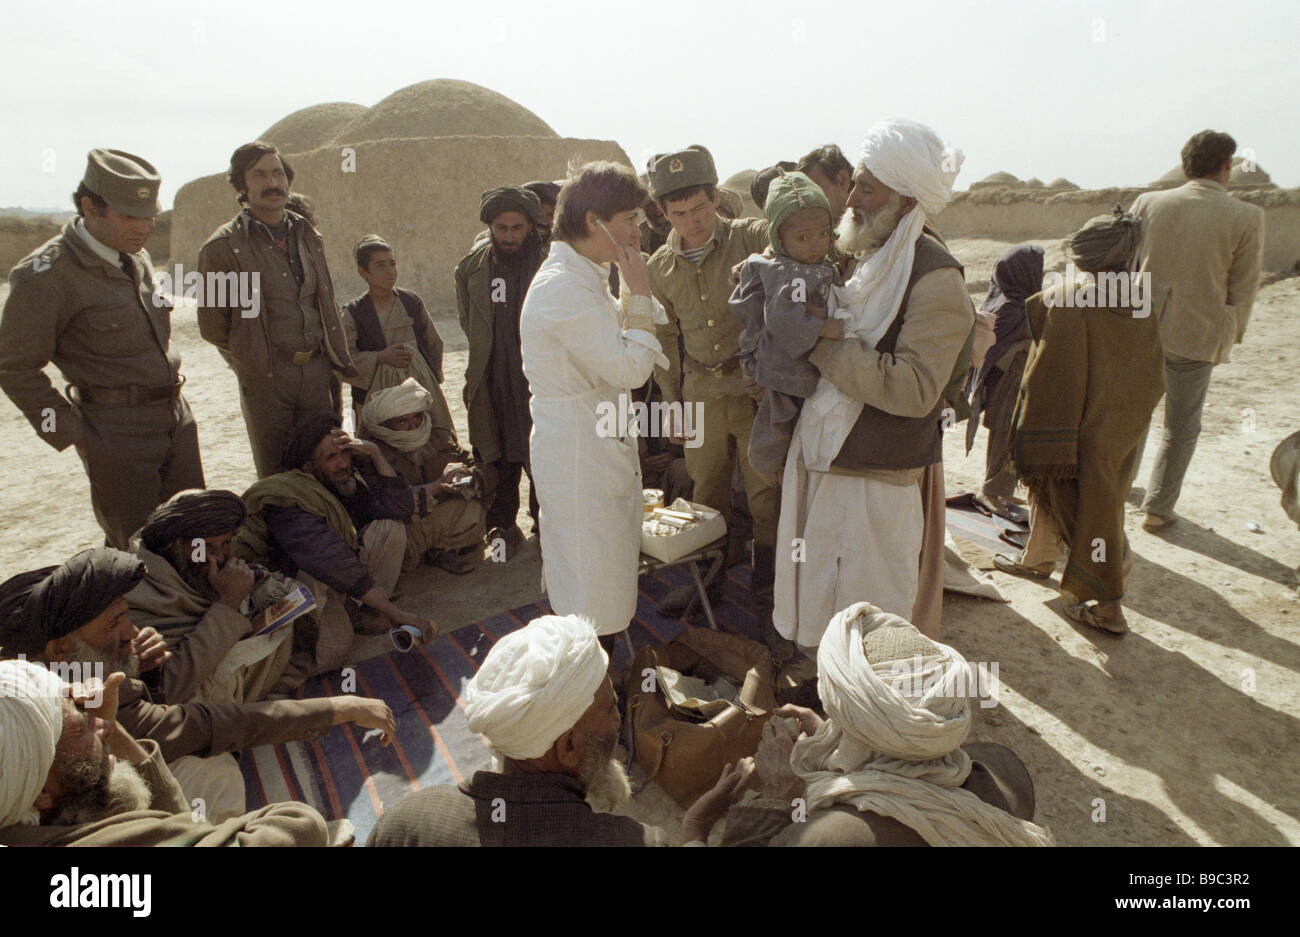 Soviet Afghanistan war - Page 6 Soviet-doctor-in-an-afghan-village-B9C3R2